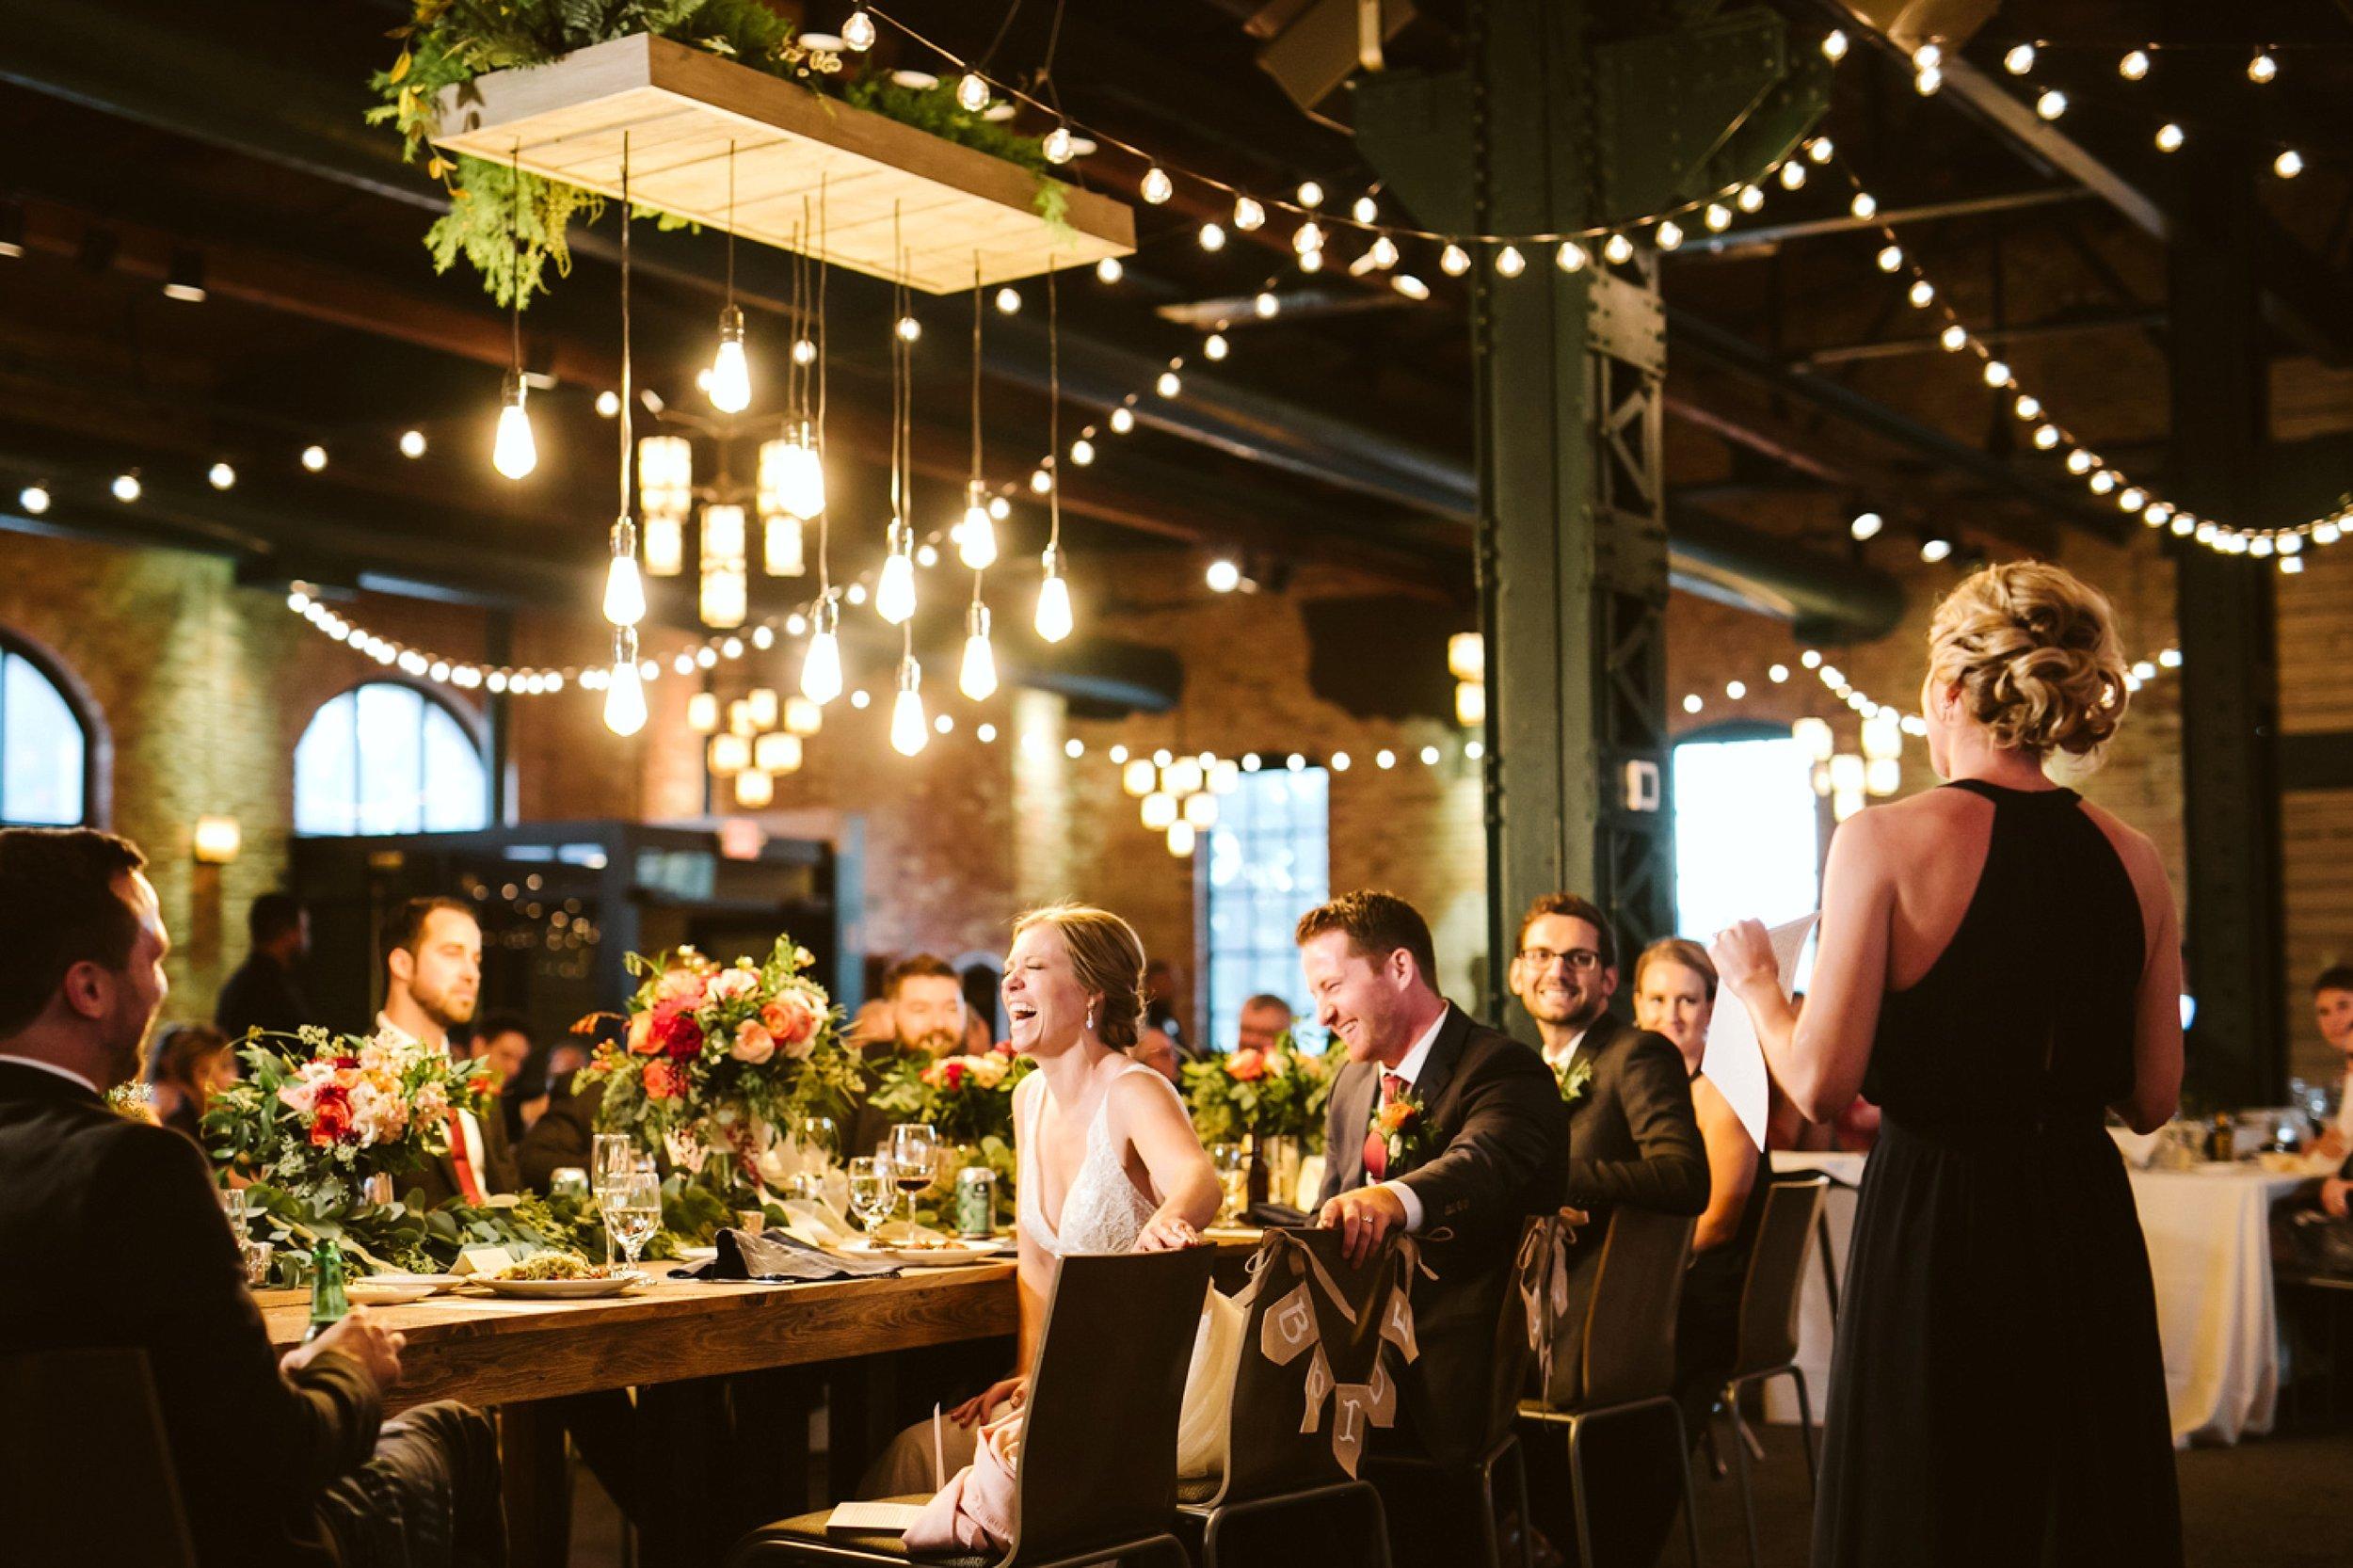 Nicollet-Island-Pavilion-Minneapolis-September-Coral-Navy-Wedding-146.jpg